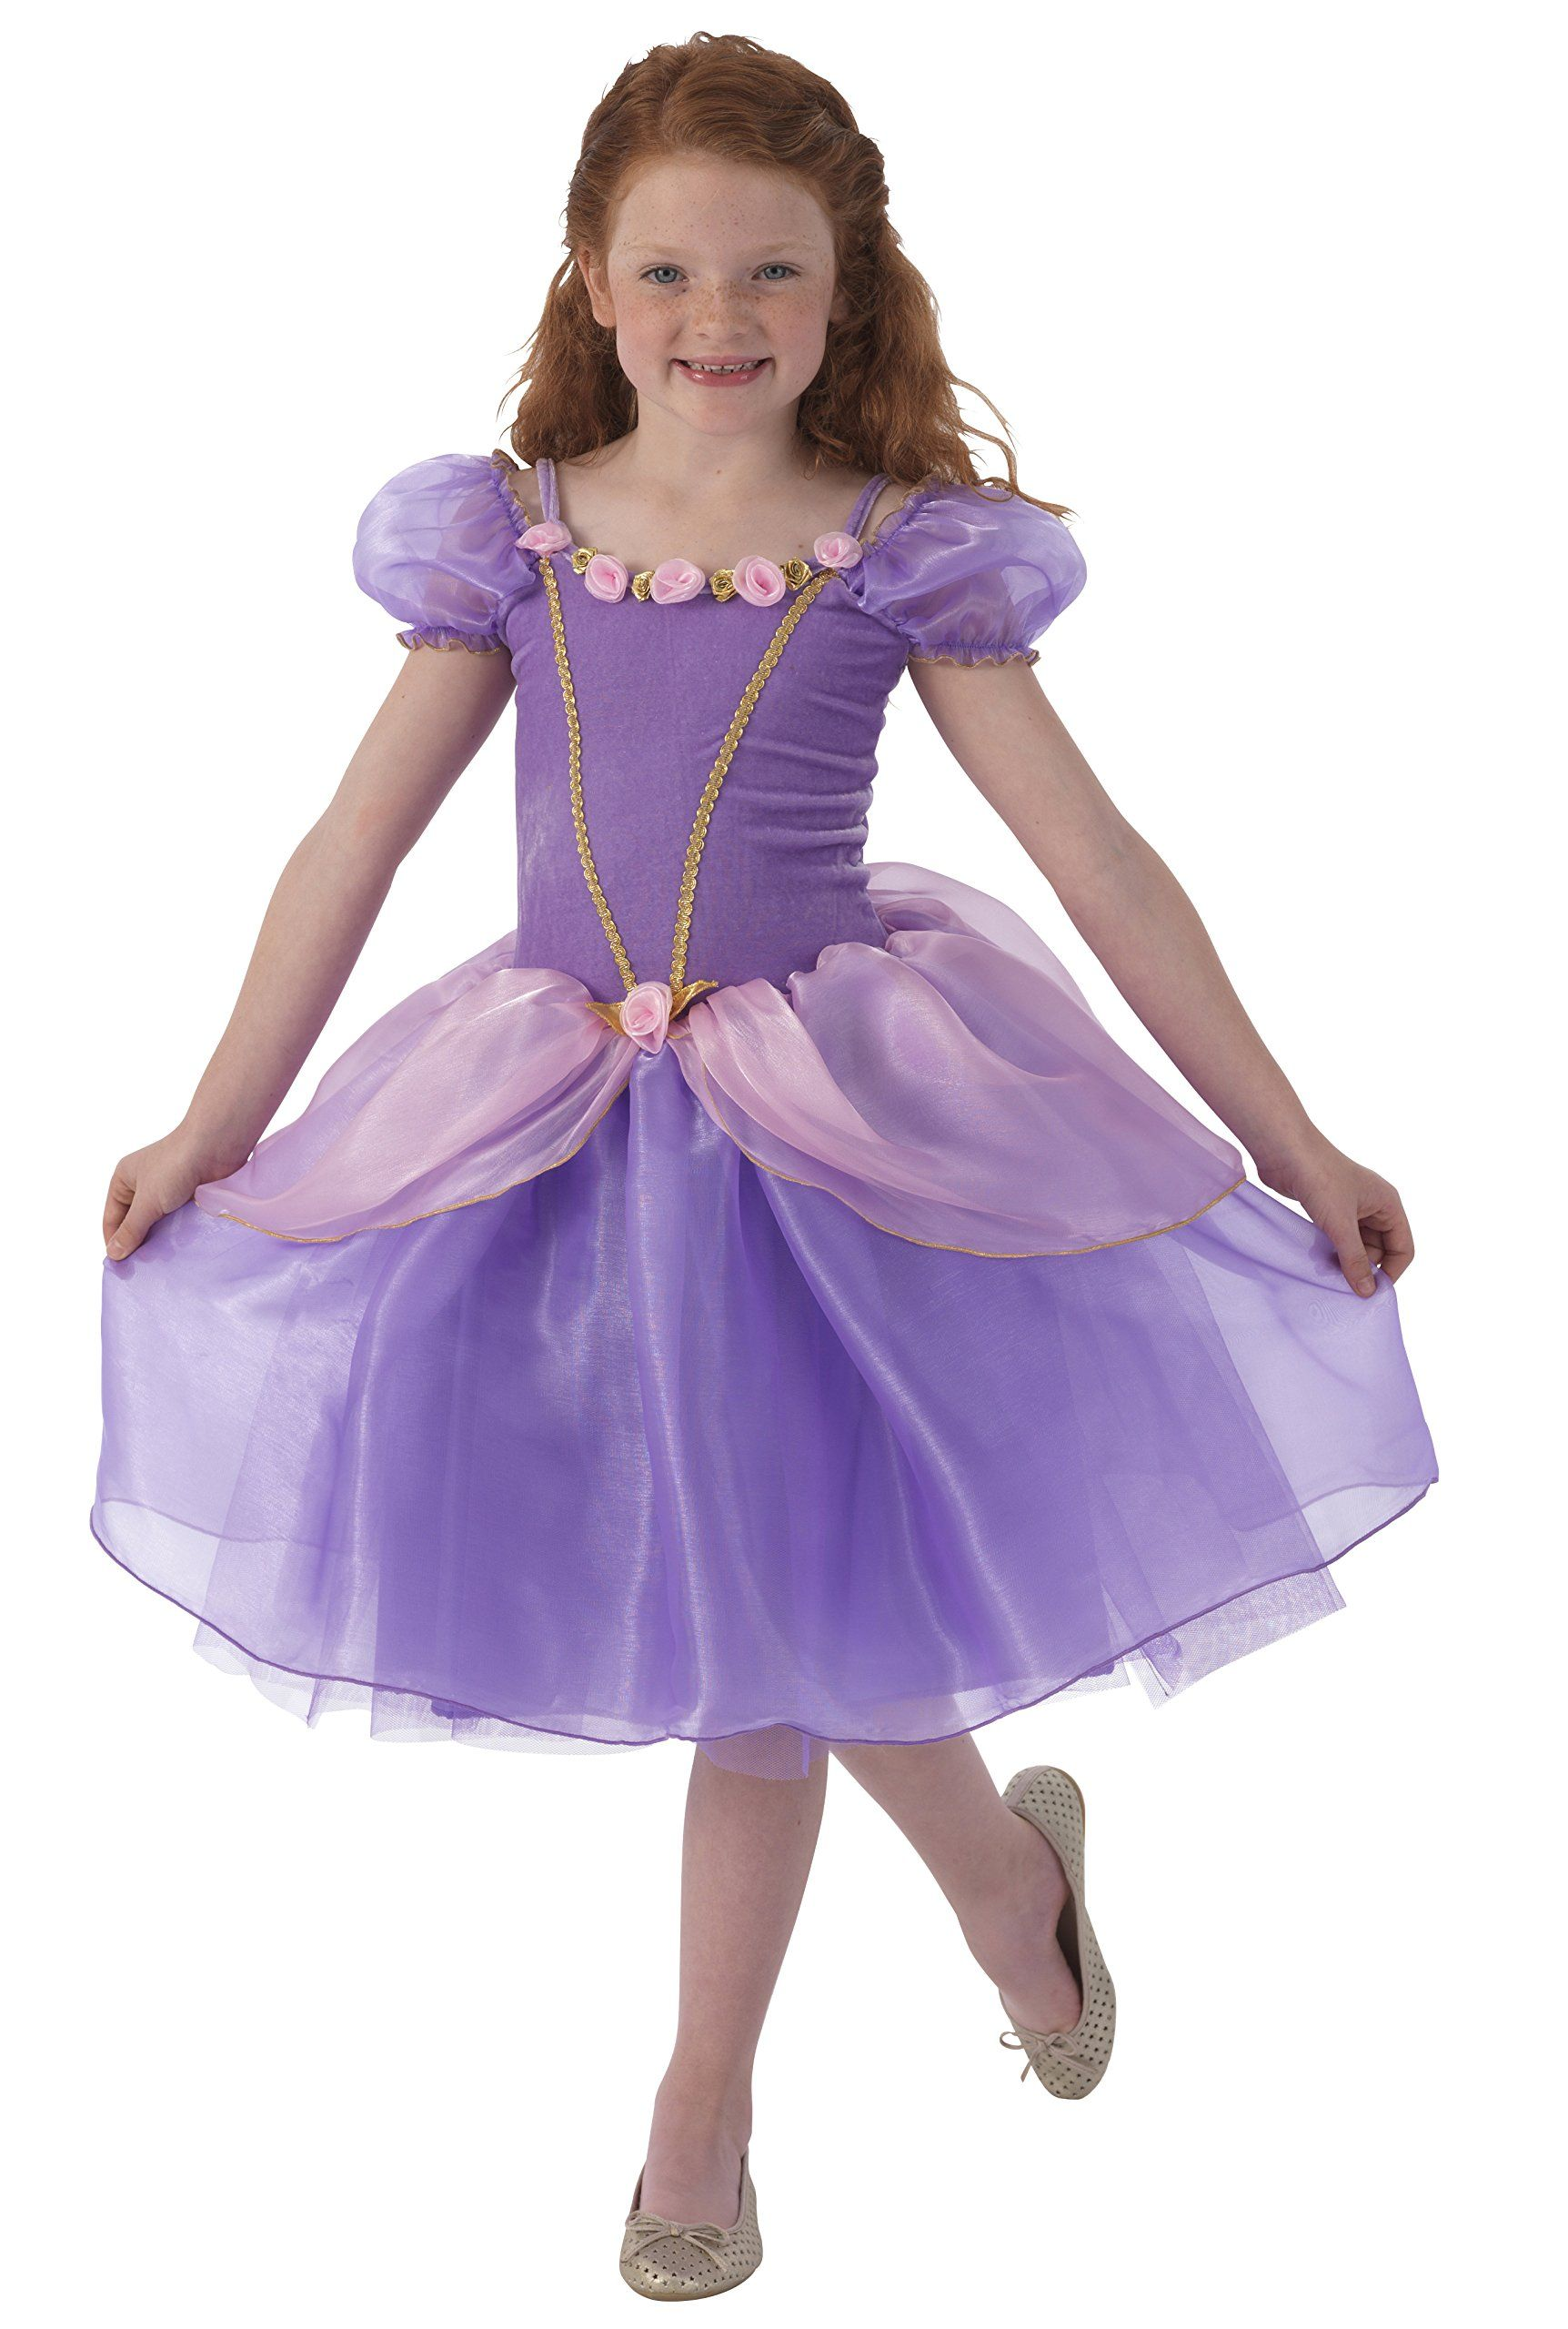 Kidkraft purple rose princess dress up costume l find